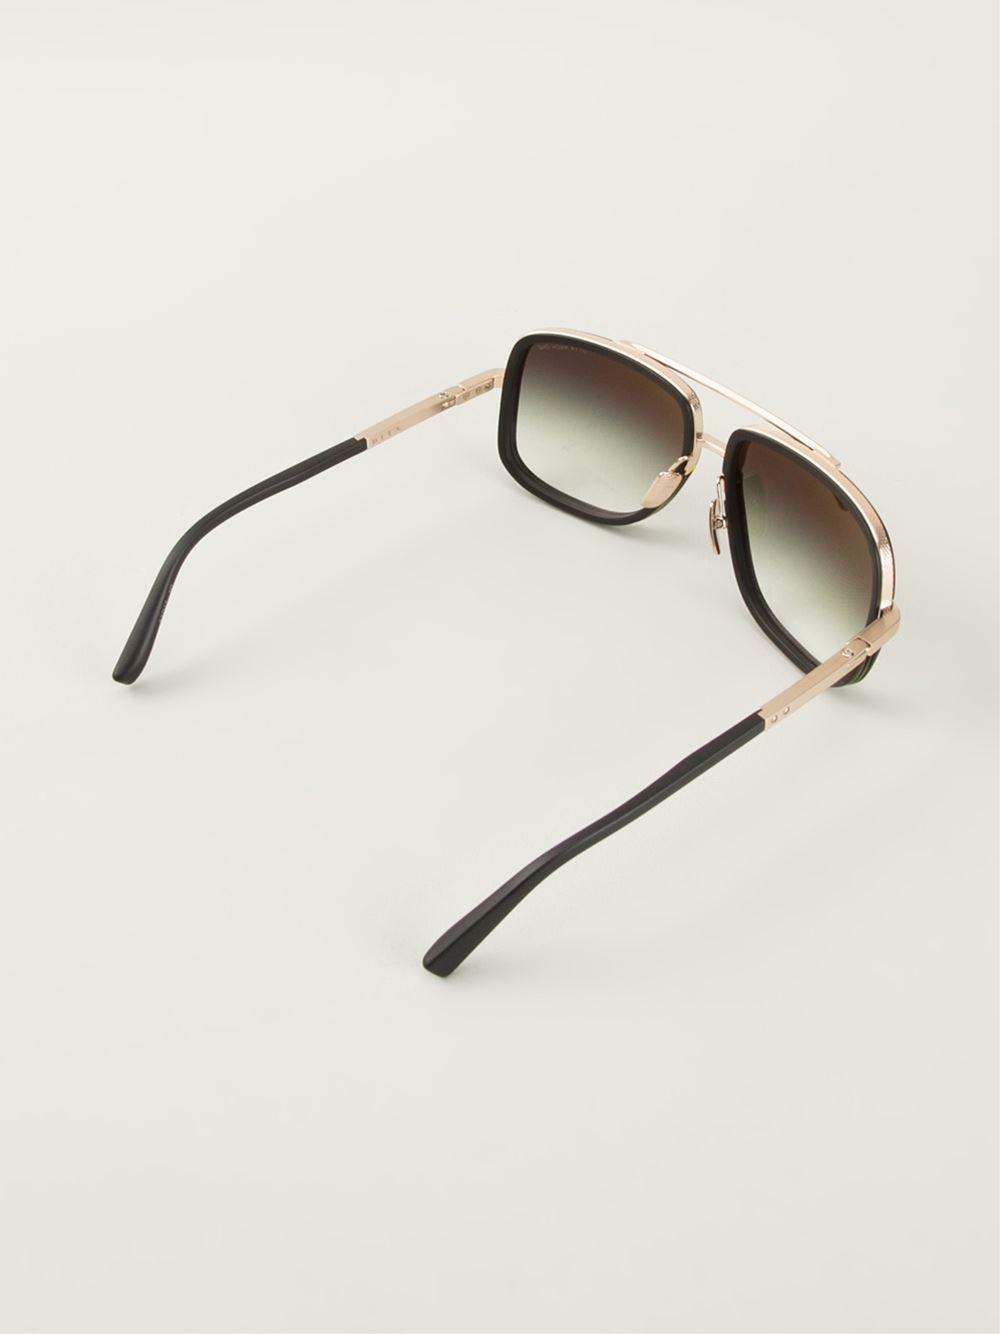 Dita Eyewear Dita Sunglasses In Metallic For Men Lyst